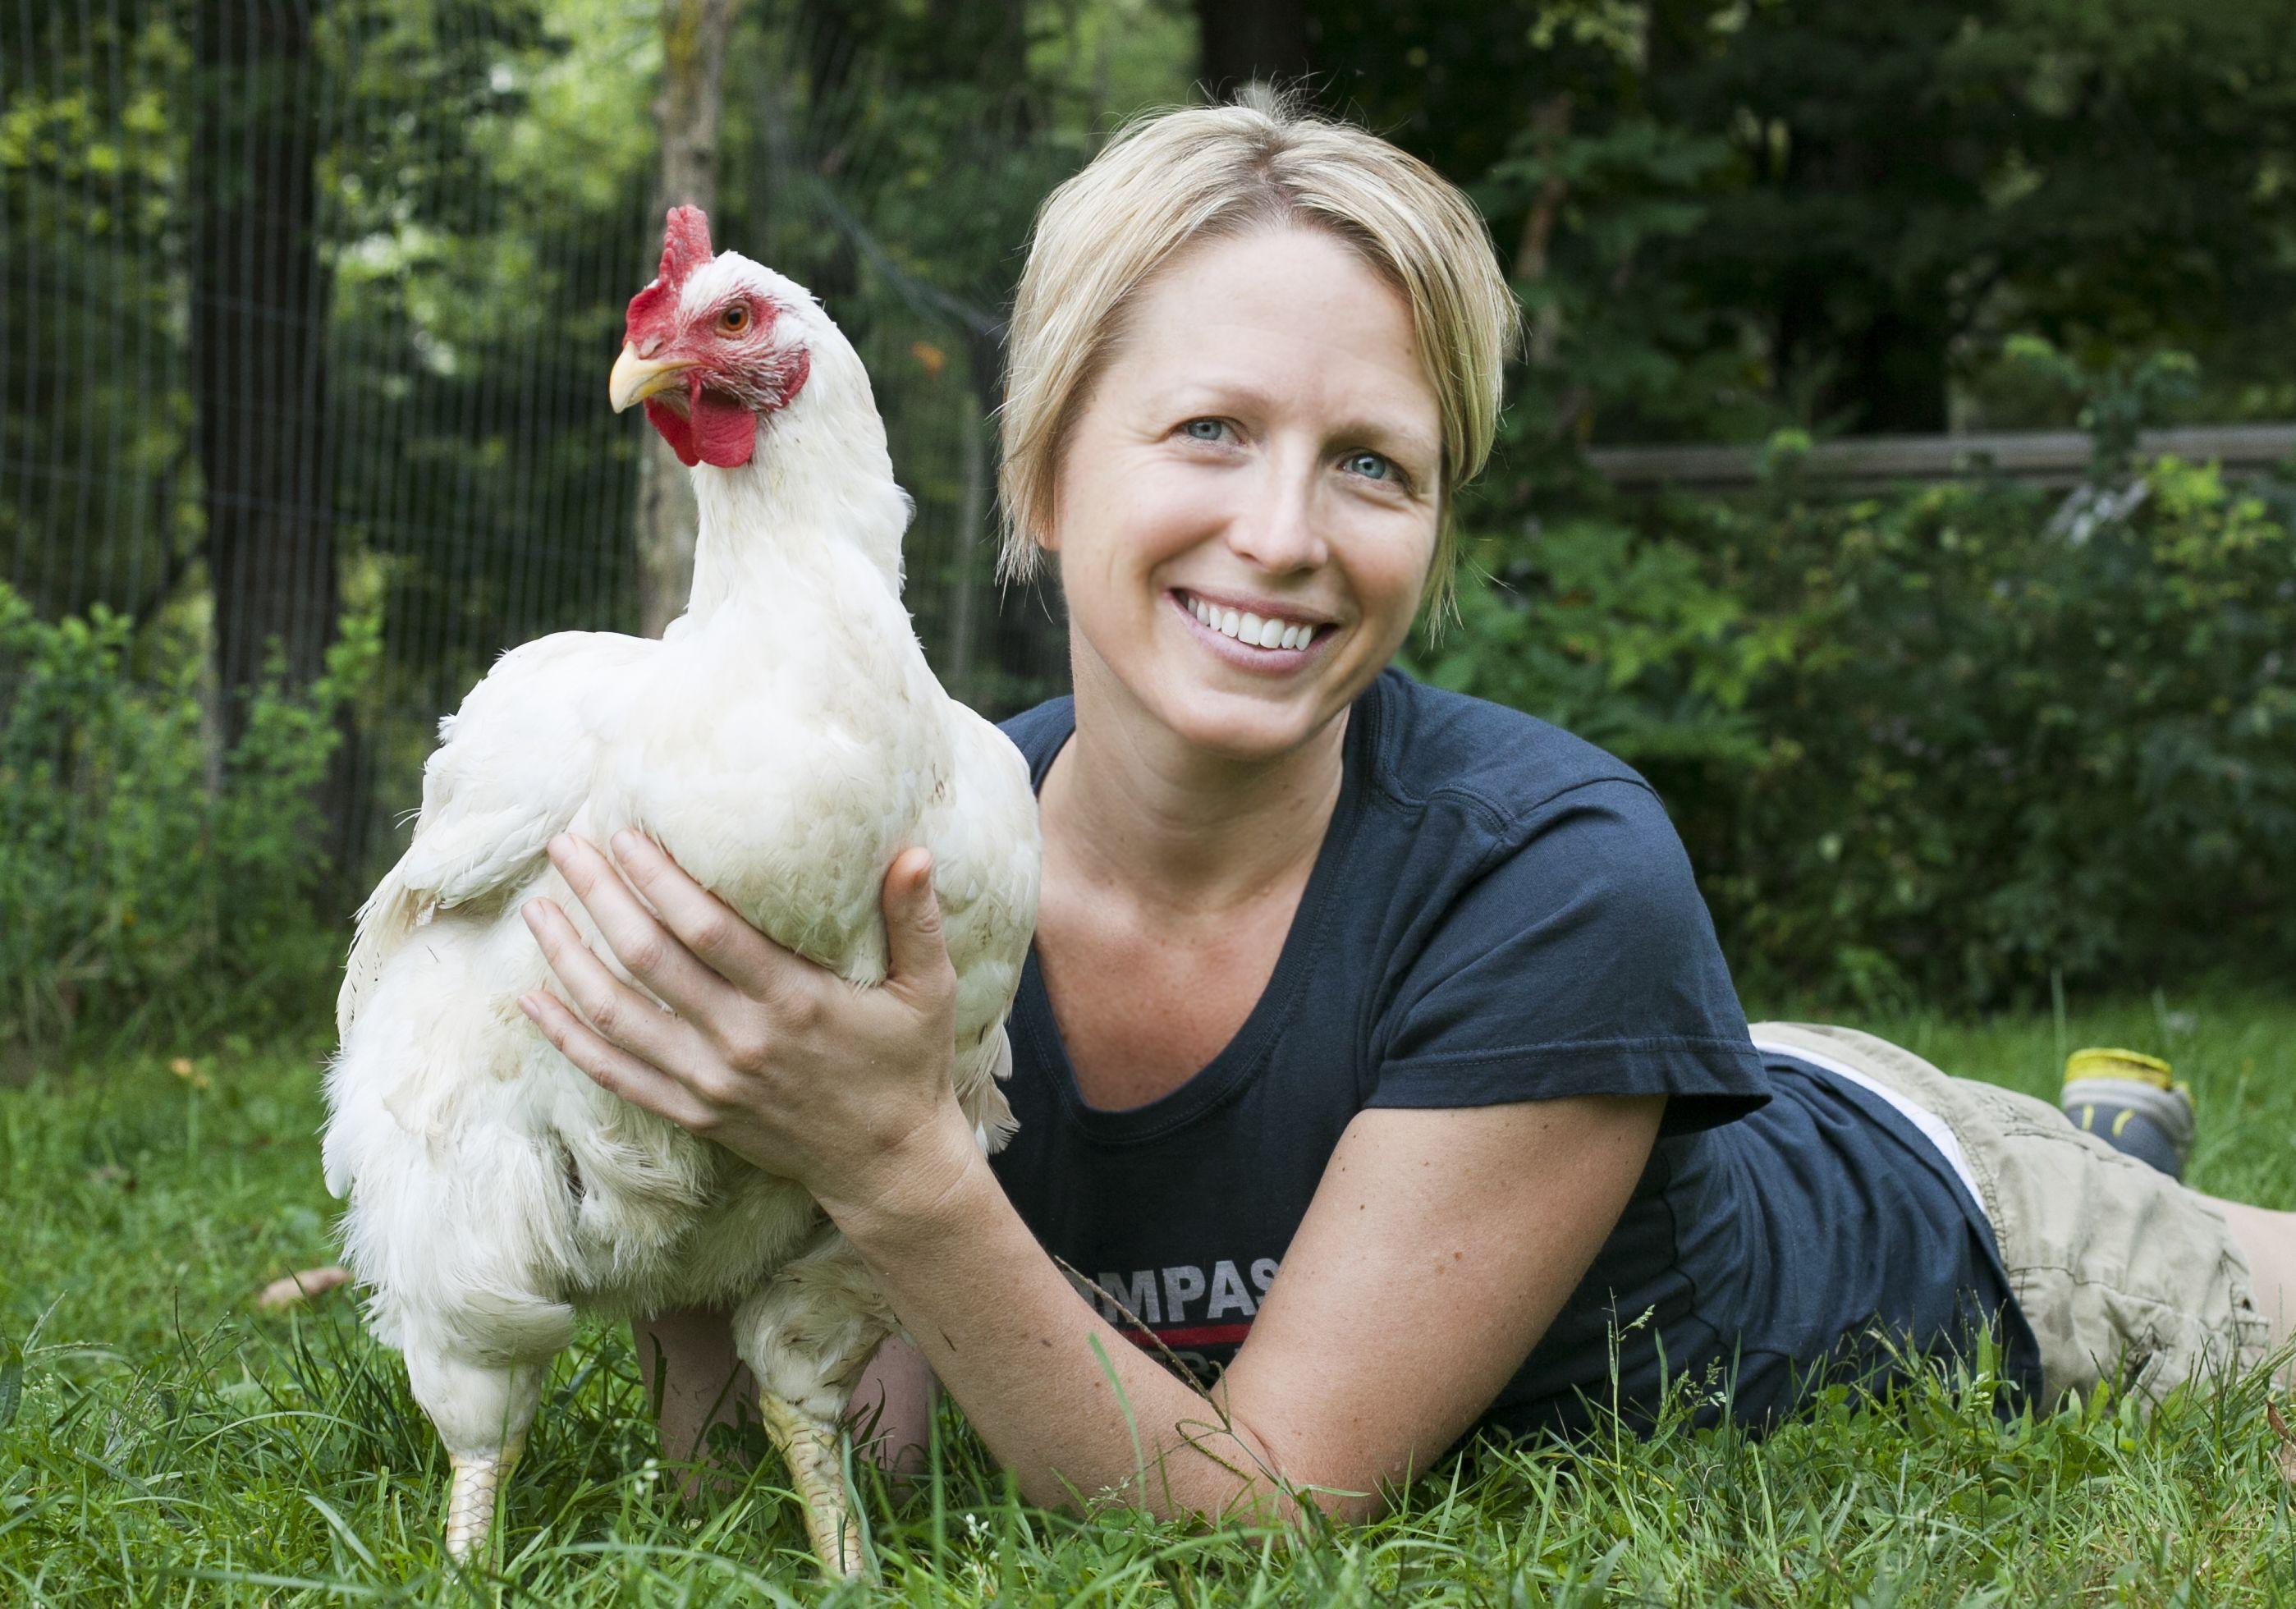 Erica Meier, Compassion Over Killing